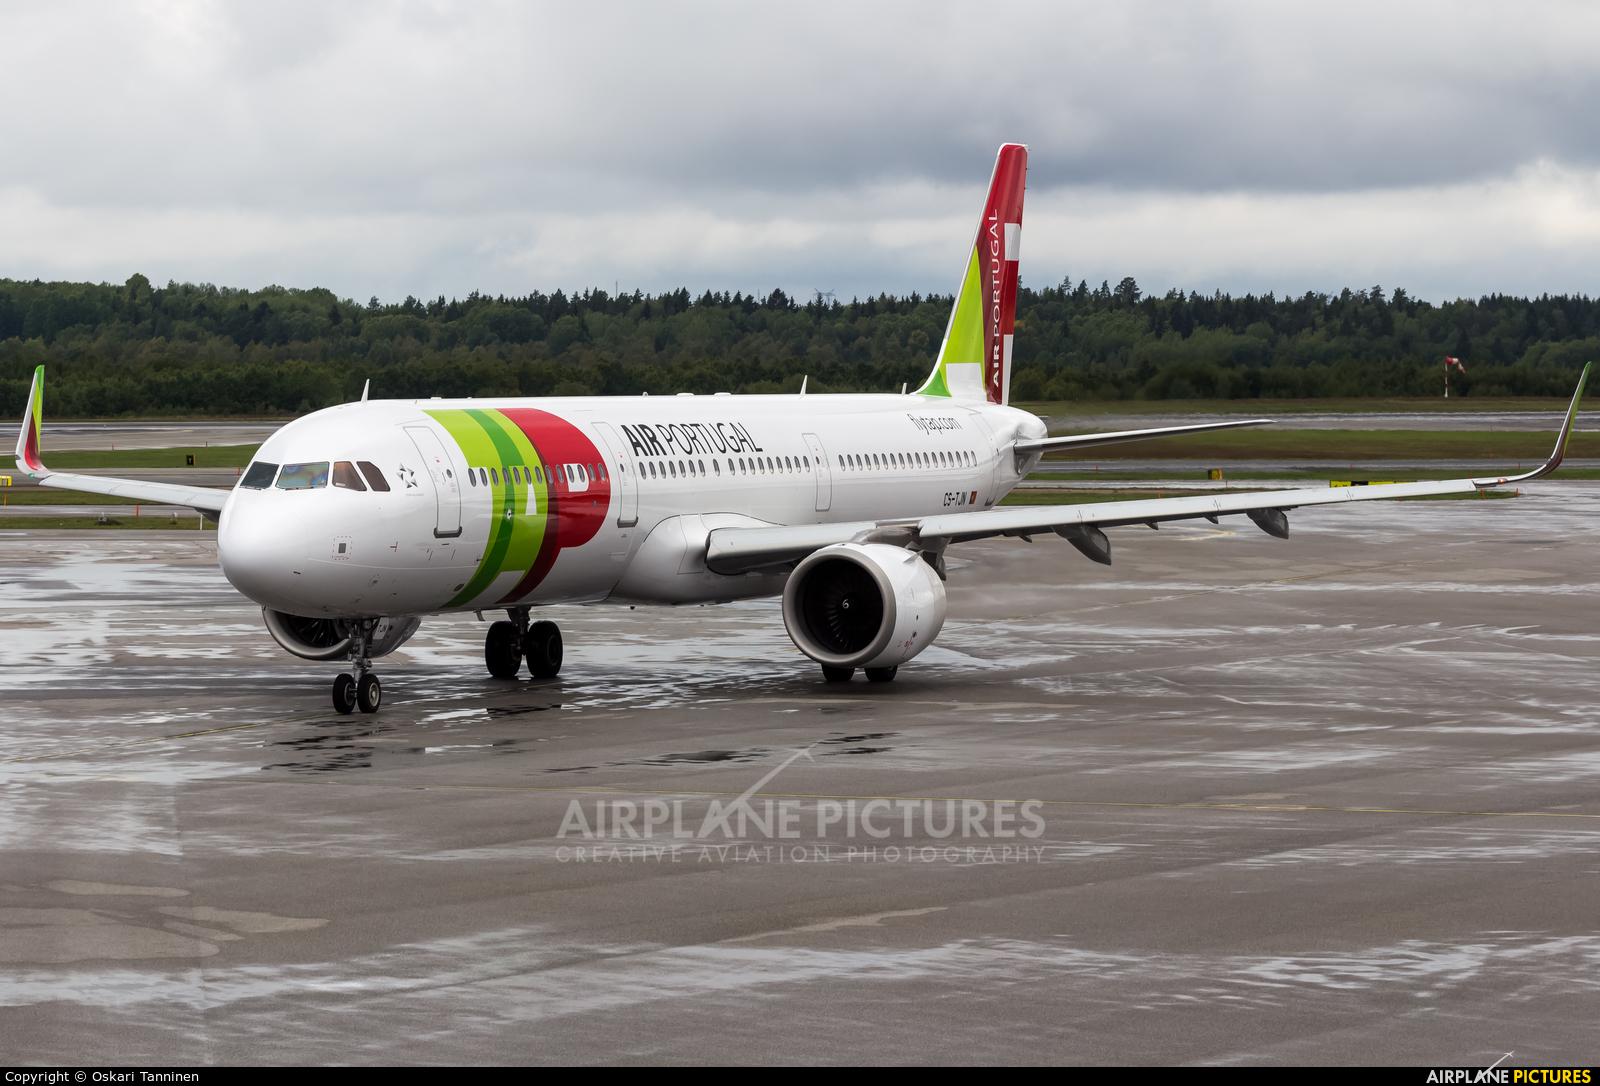 TAP Portugal CS-TJN aircraft at Stockholm - Arlanda